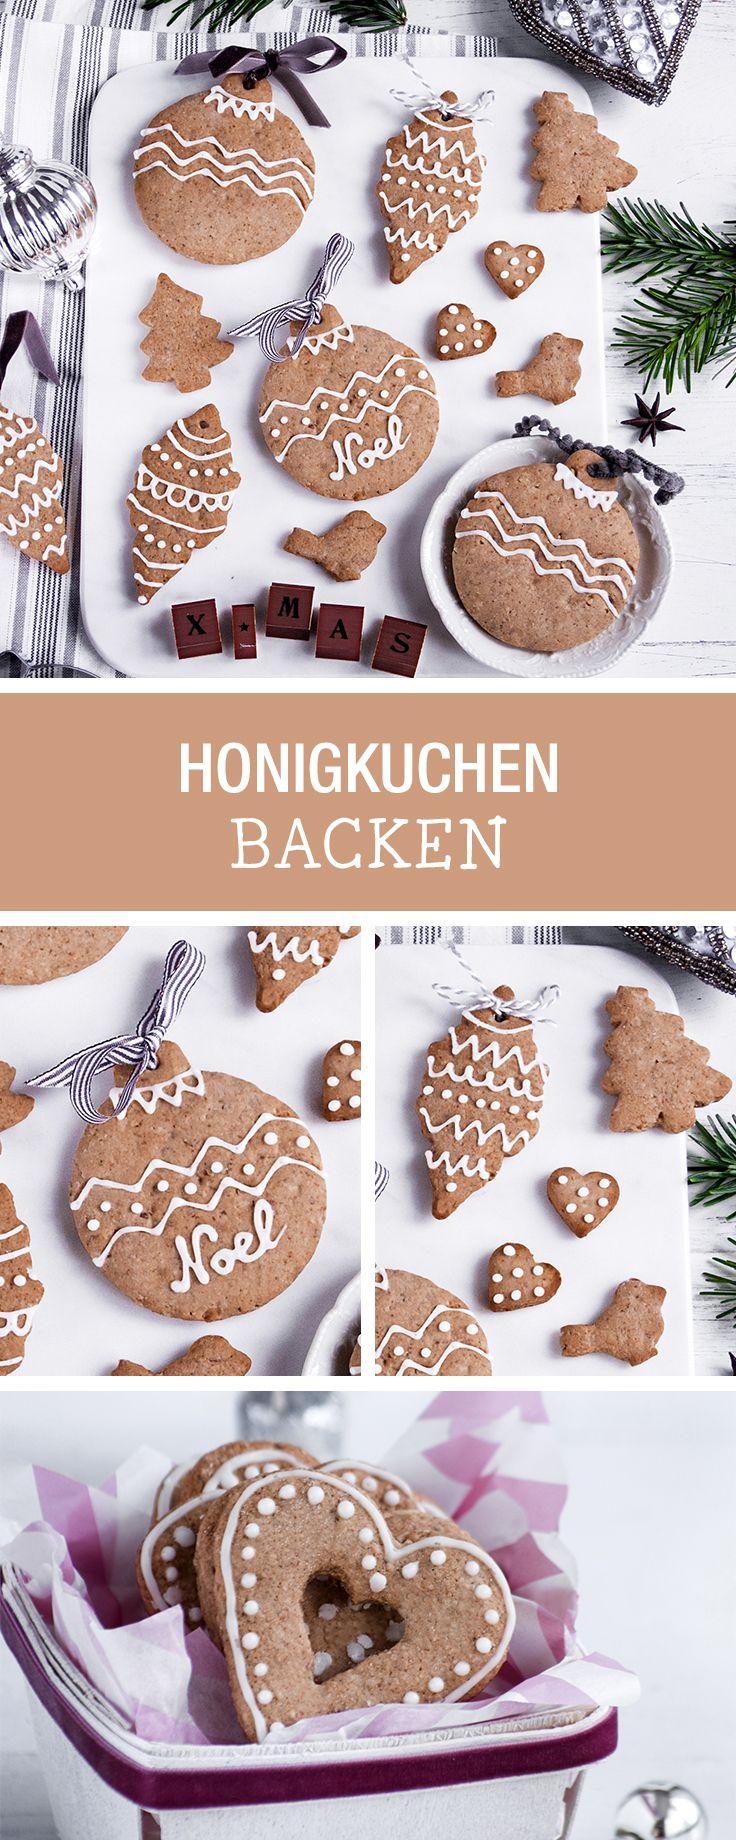 Traditionelles Weihnachtsgebäck: Honigkuchen backen / traditional christmas cookies: honey cake via DaWanda.com